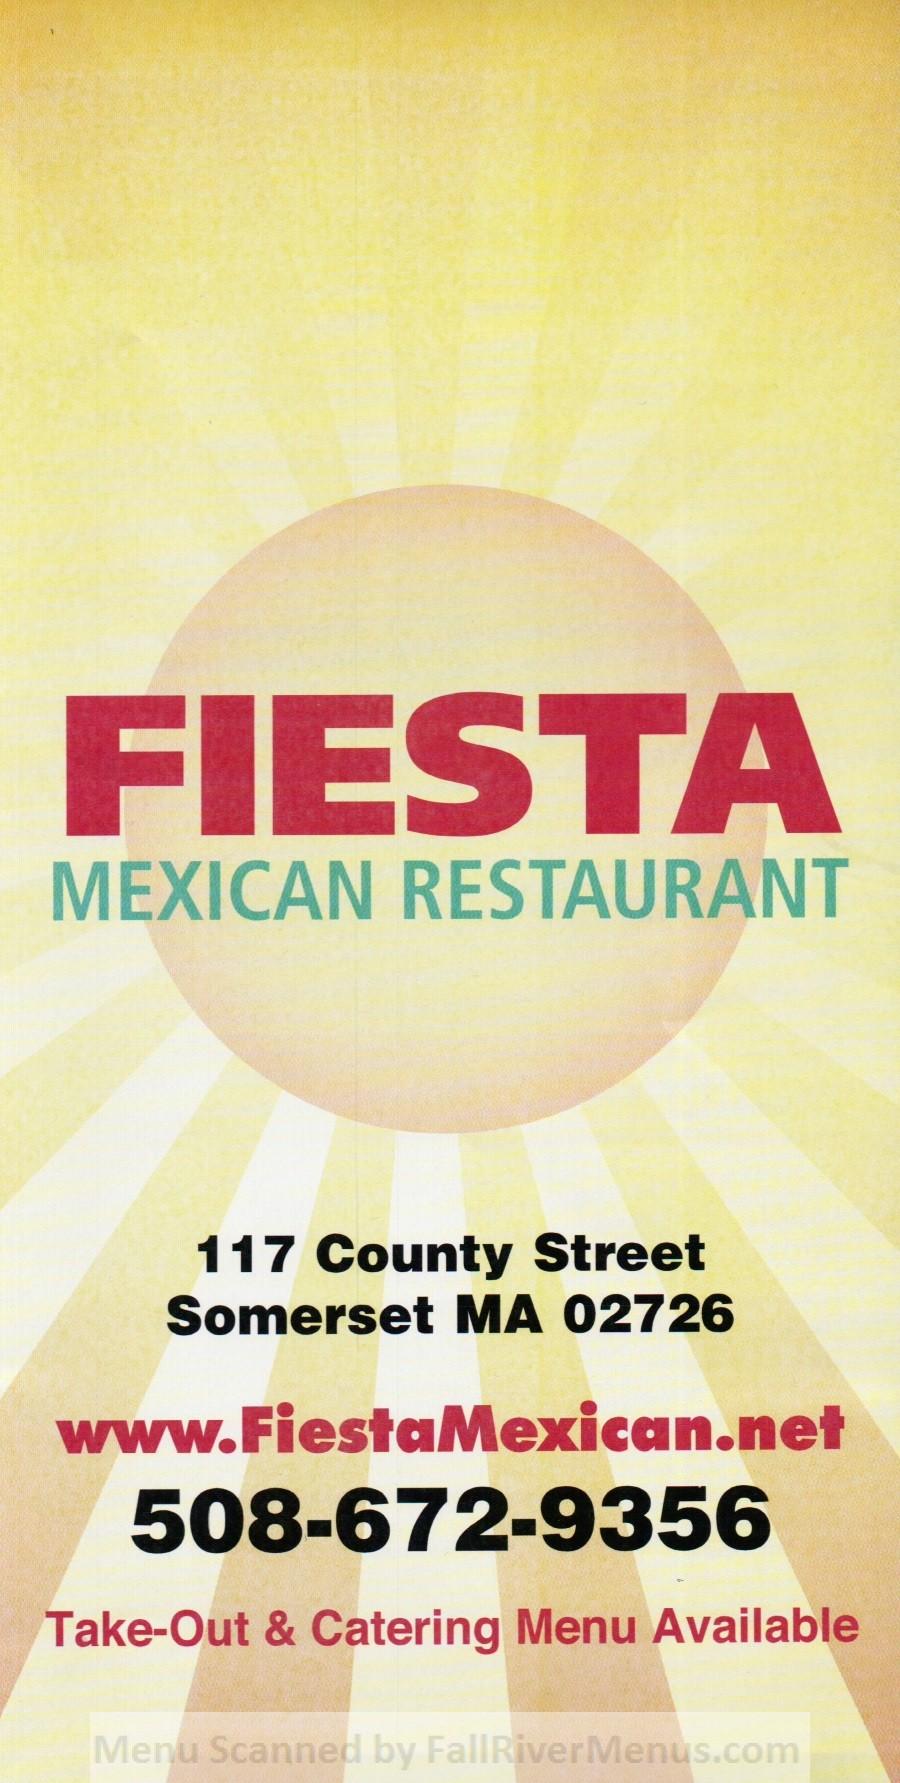 Fiesta's Mexican Restaurant